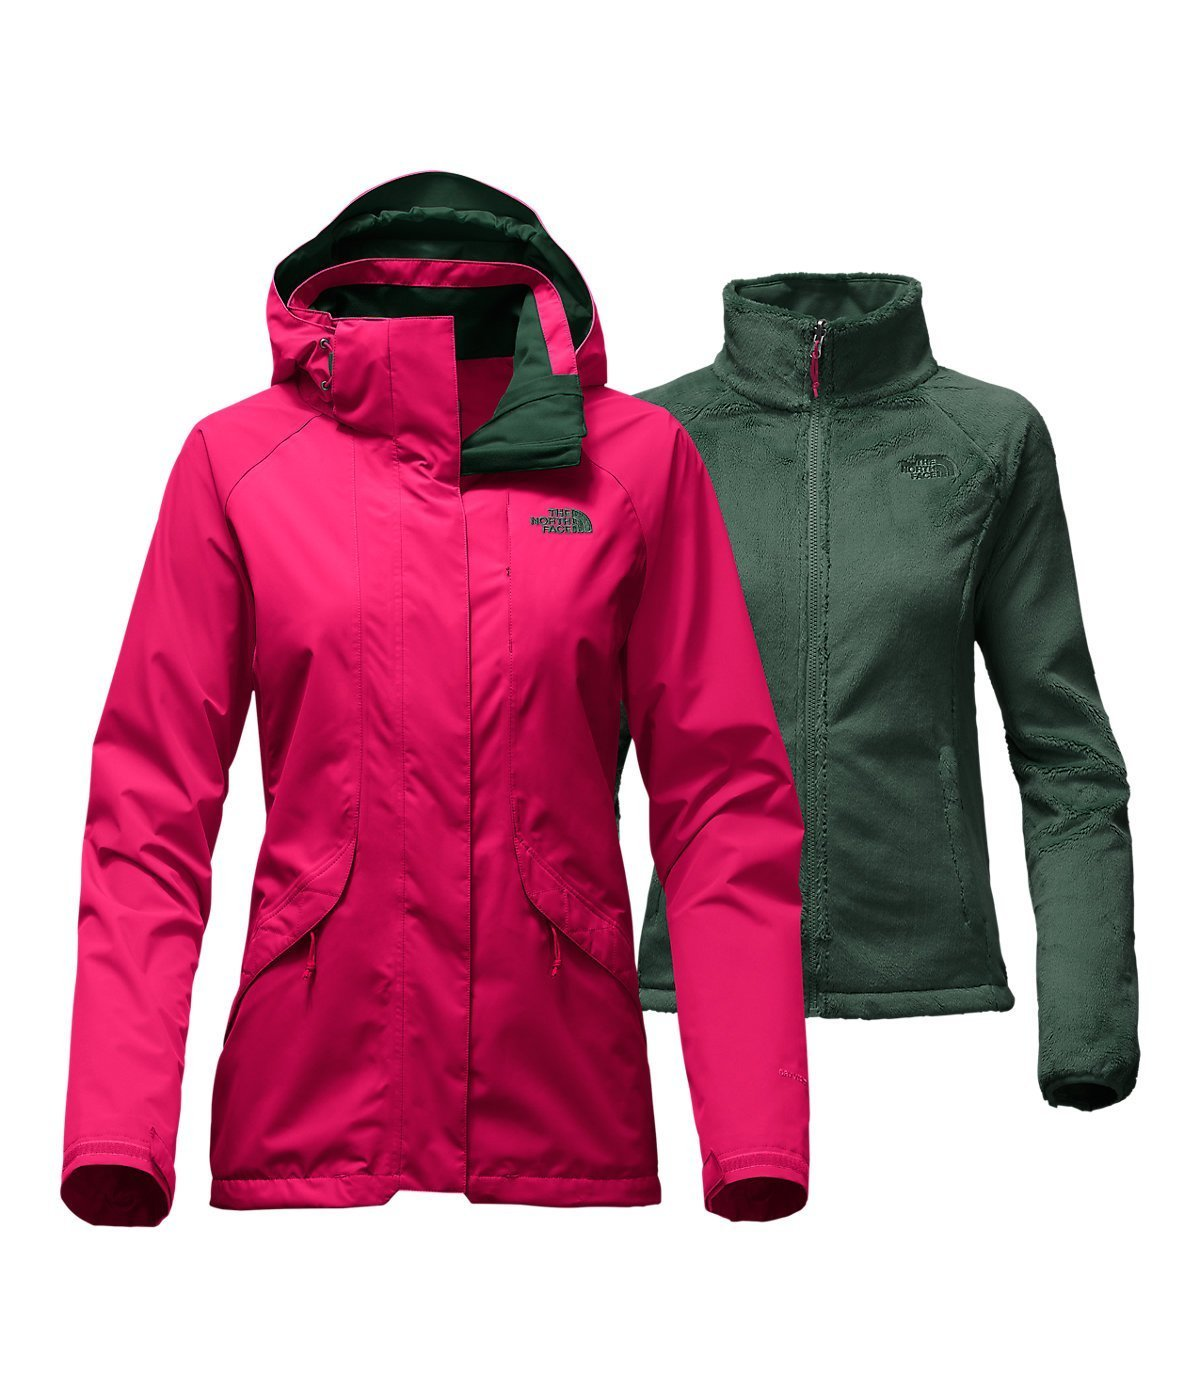 The North Face Boundary Triclimate Womens Insulated Ski Jacket Medium/Cerise Pink [並行輸入品] B075CKFJRQ